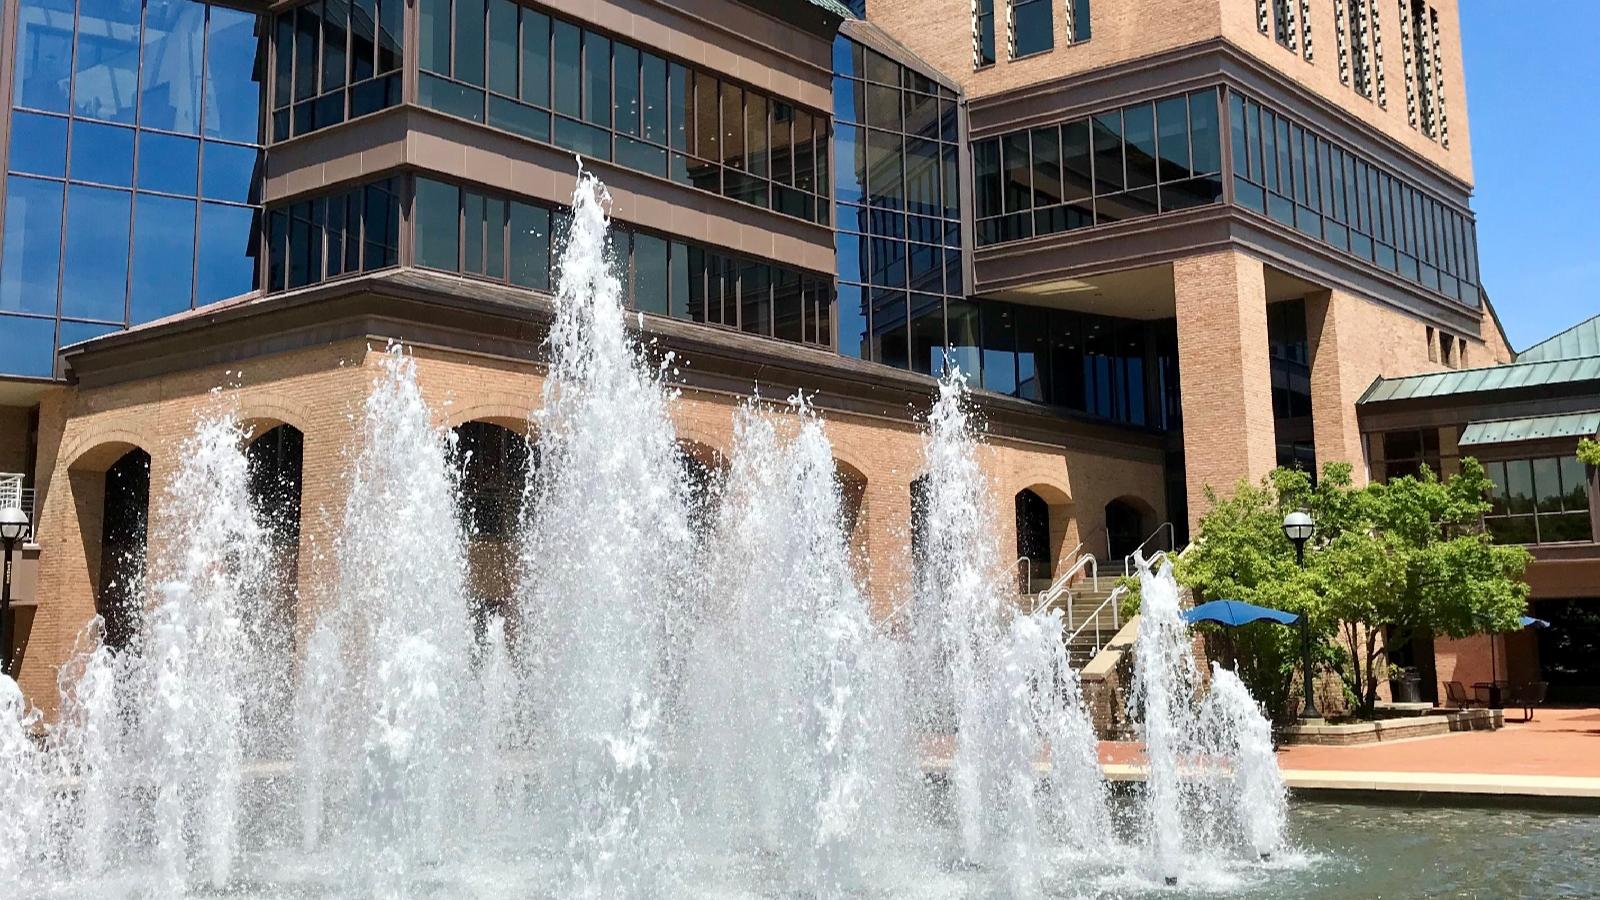 University of Michigan Fountain